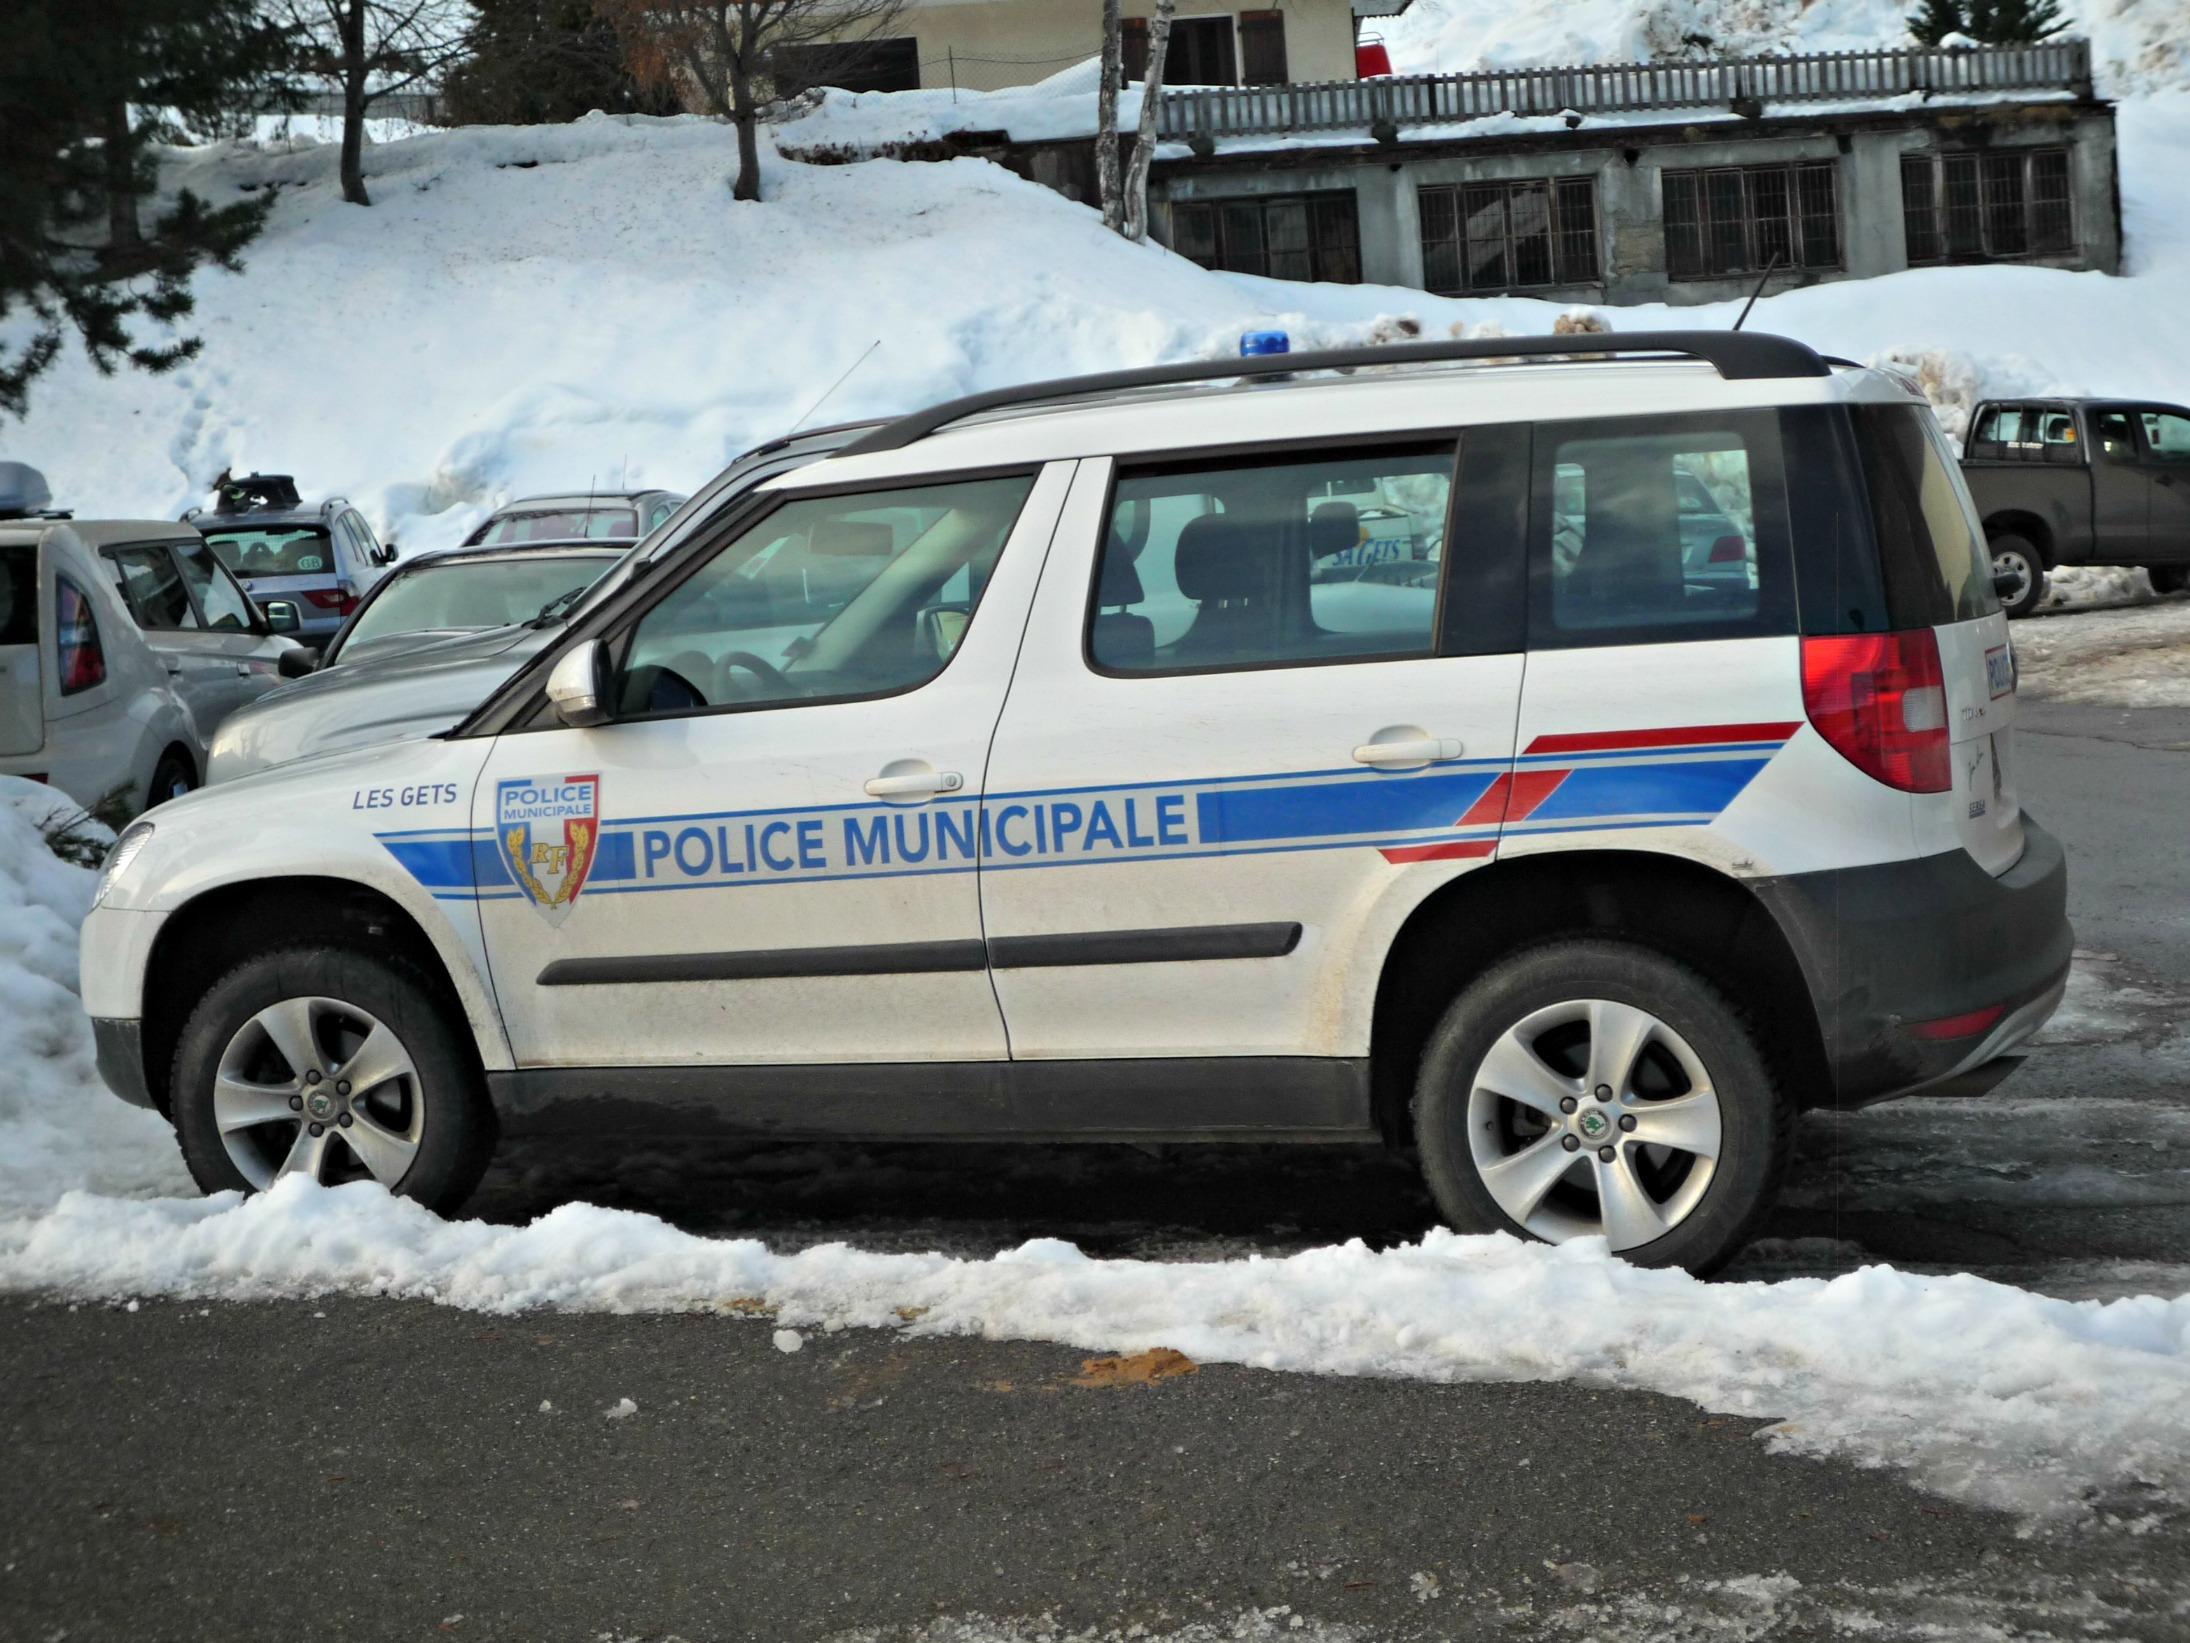 Skoda au service de la police - Page 3 3189a2a61e